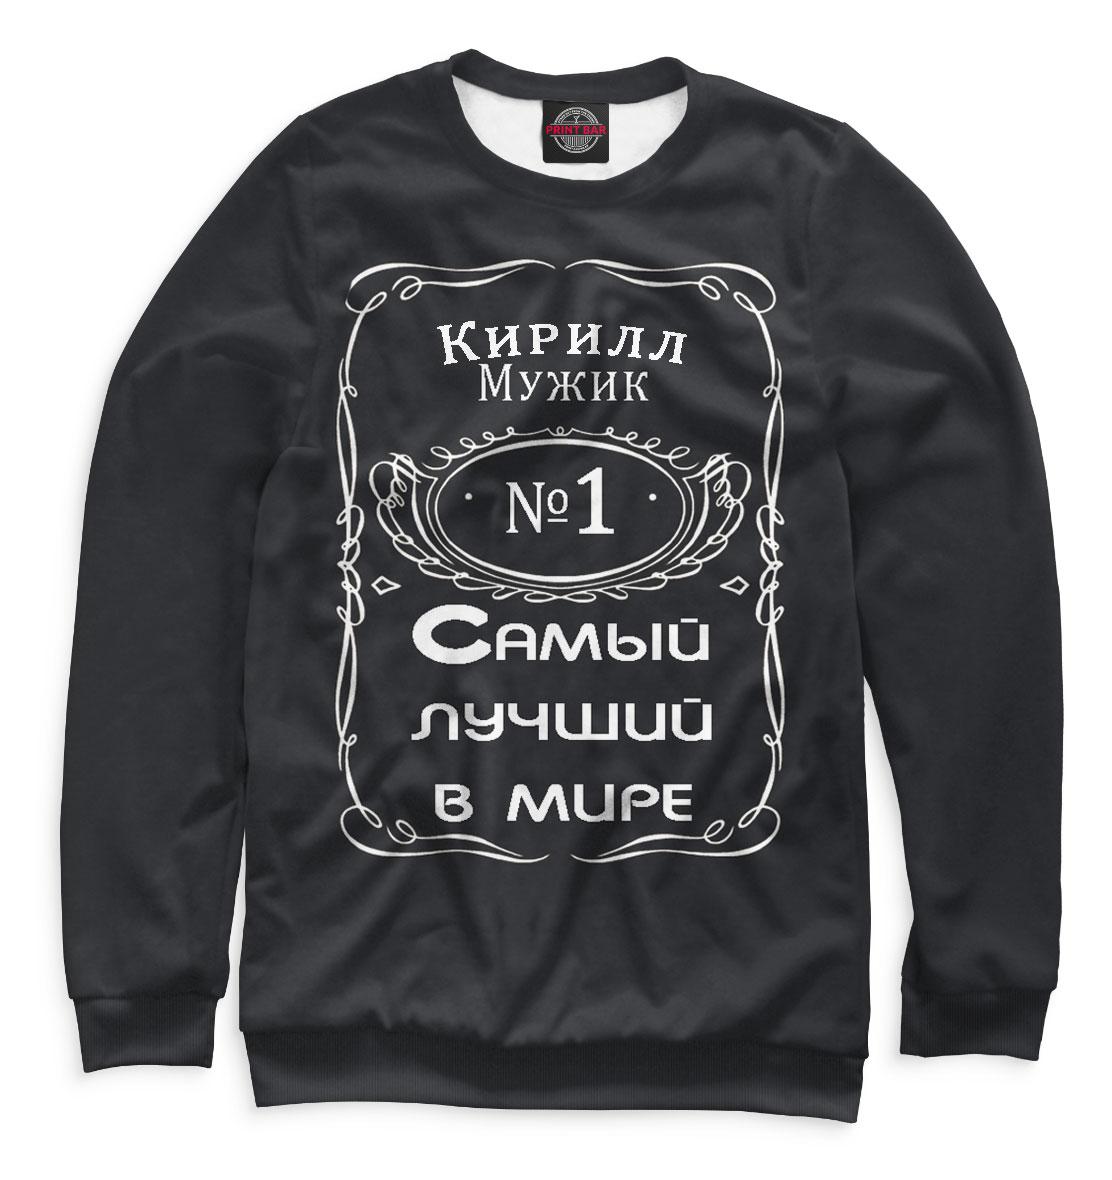 Купить Мужик Кирилл, Printbar, Свитшоты, KIR-488349-swi